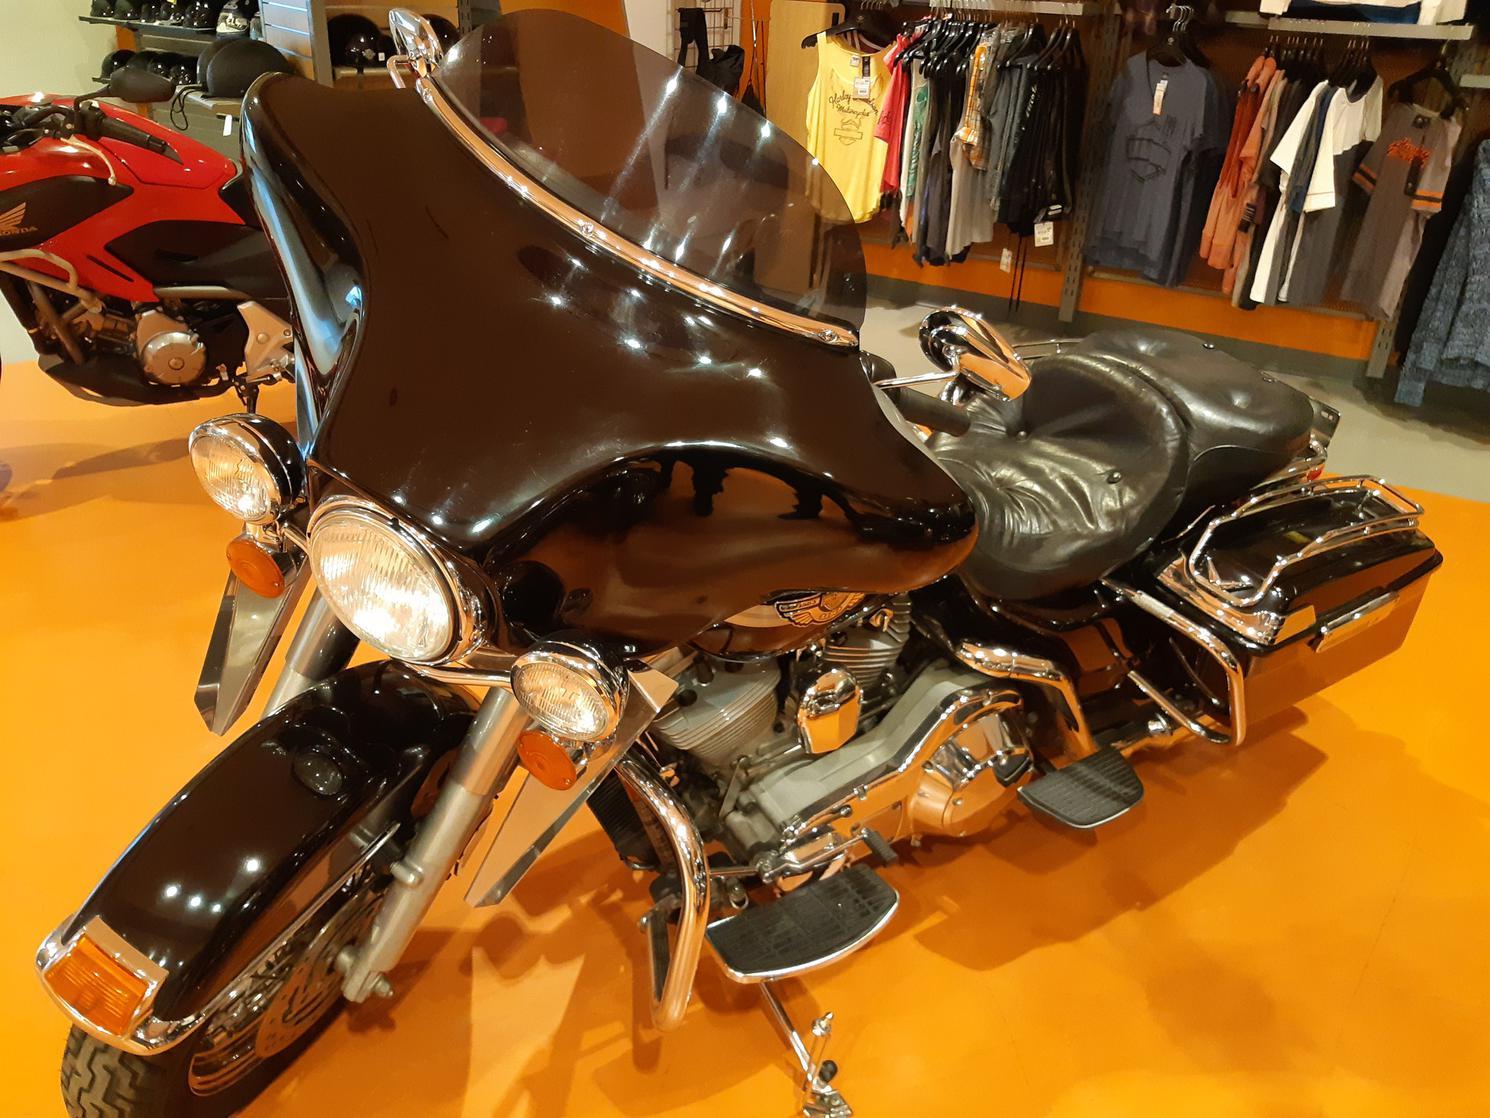 2003 Harley Davidson FLHT